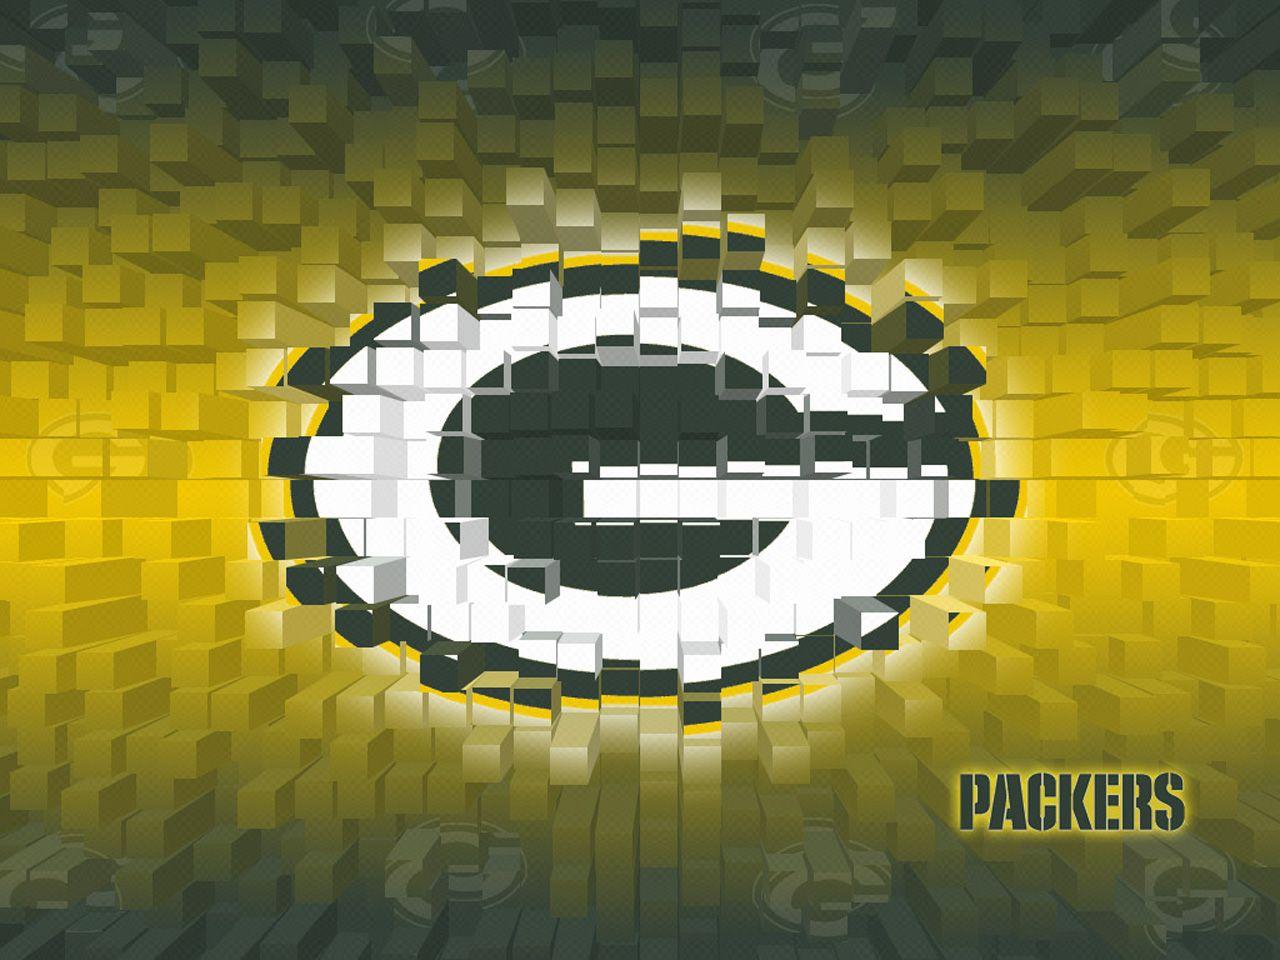 Green Bay Packers Desktop Wallpaper Free 24999 Images Green Bay Packers Wallpaper Green Bay Packers Green Bay Packers Logo